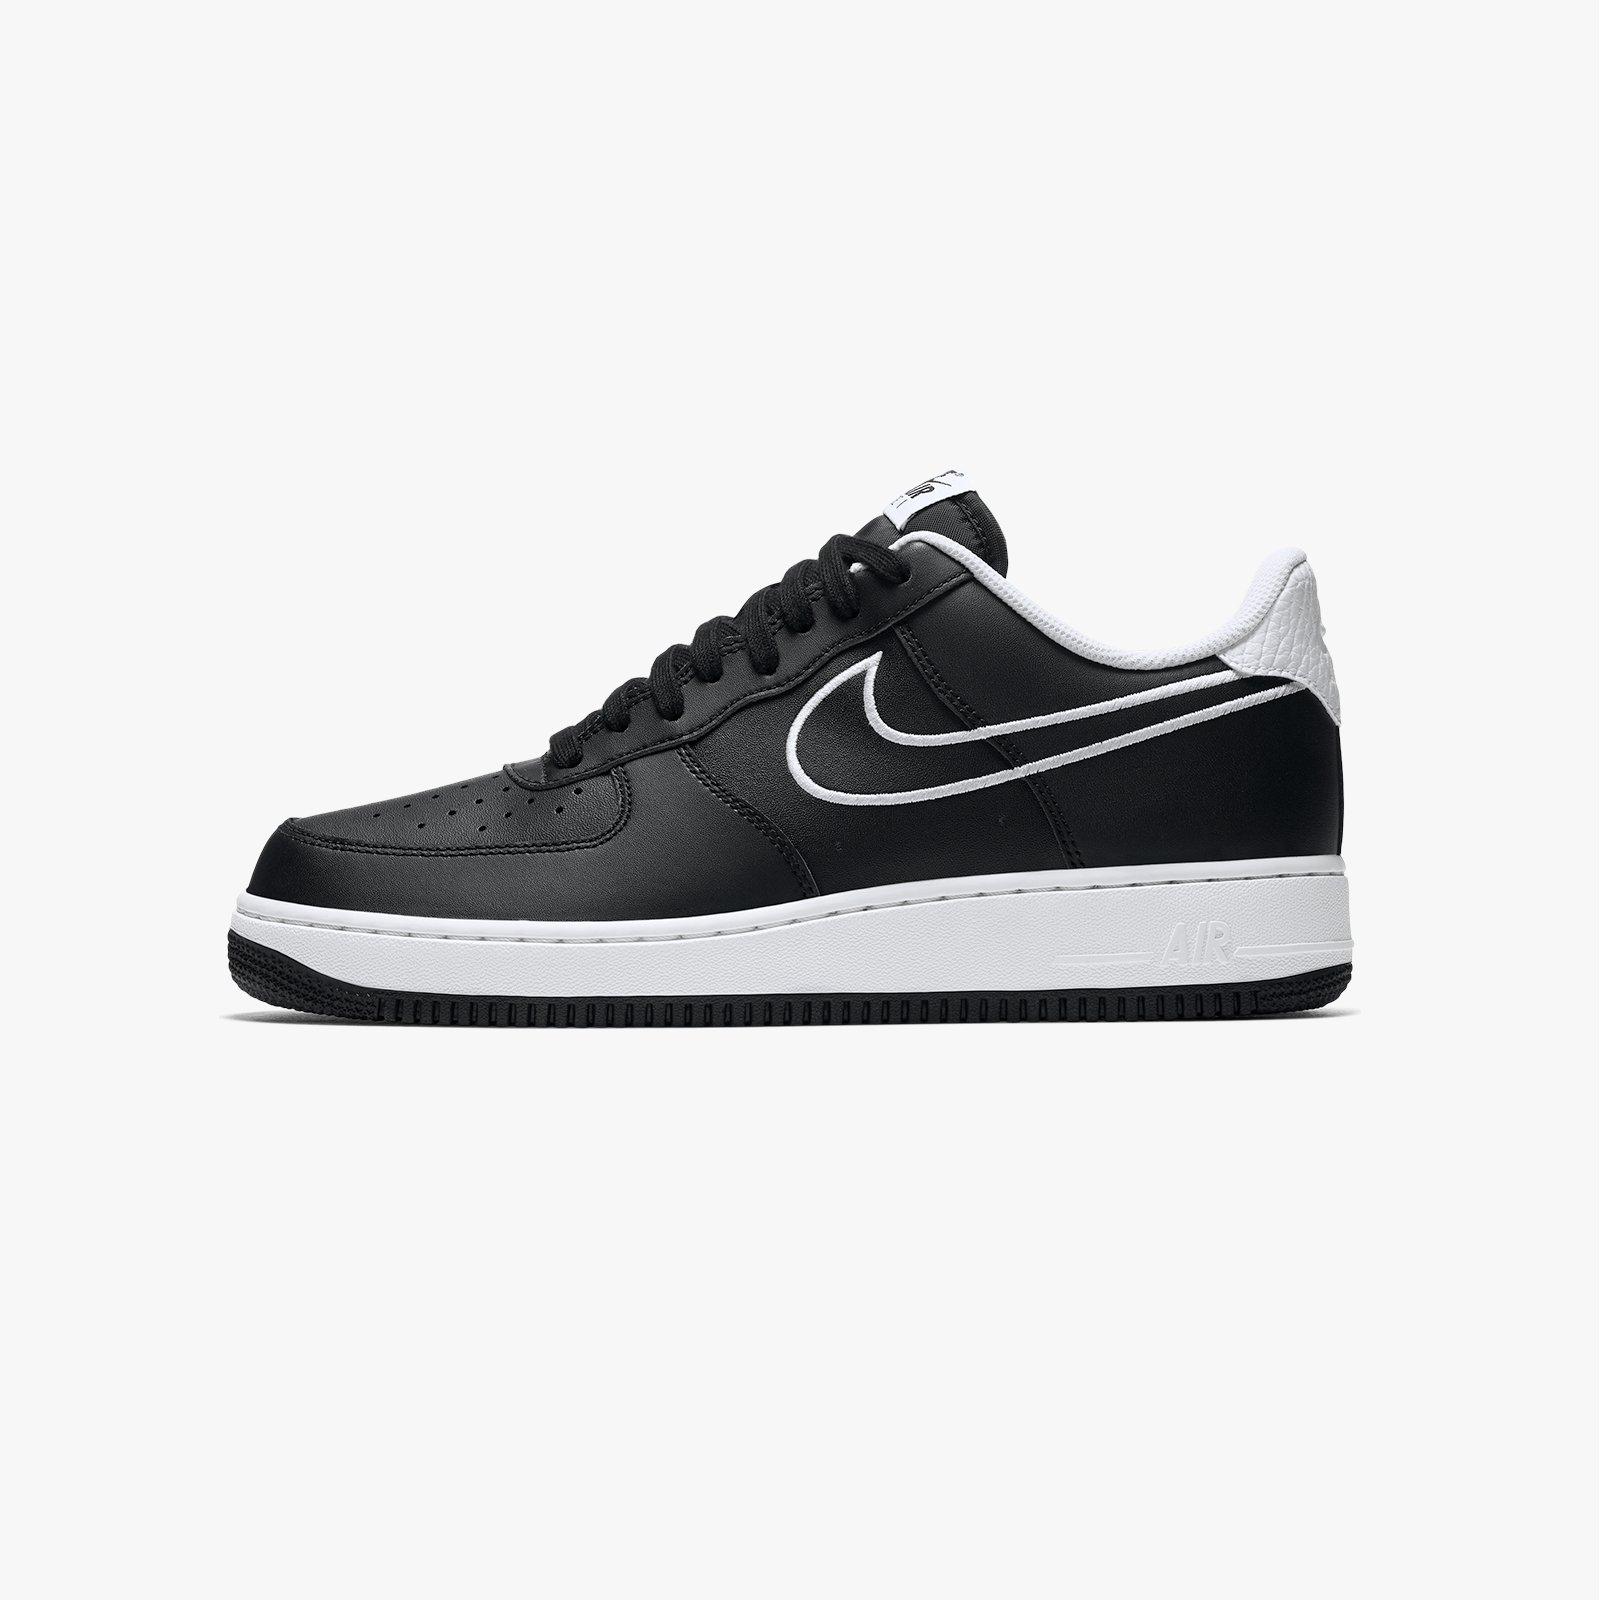 Air Force 1 '07 Leather 'Black' Nike AJ7280 001 black